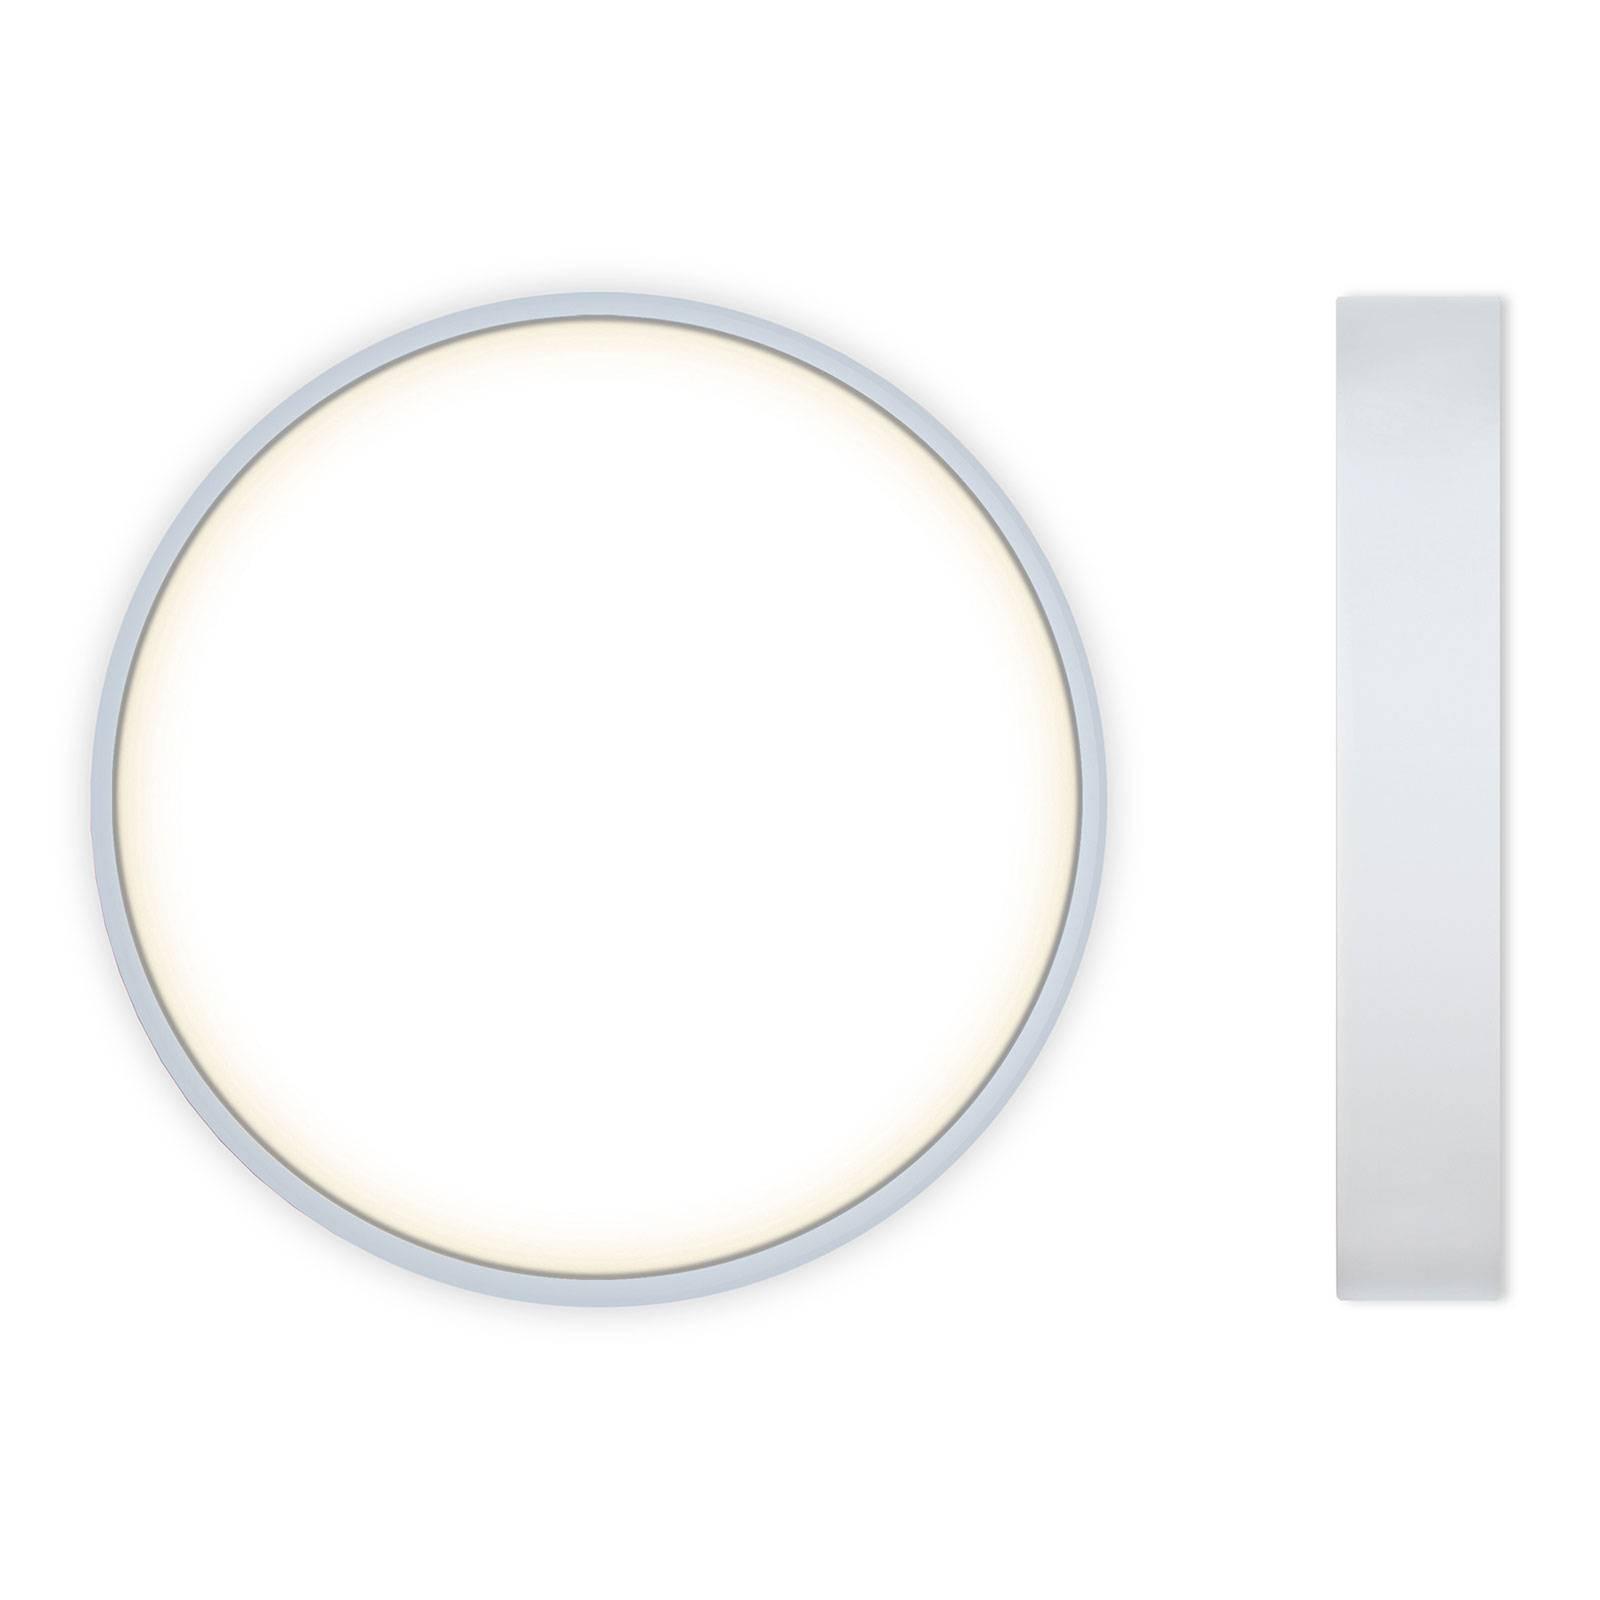 Innr LED plafondlamp RCL 110, rond, wit